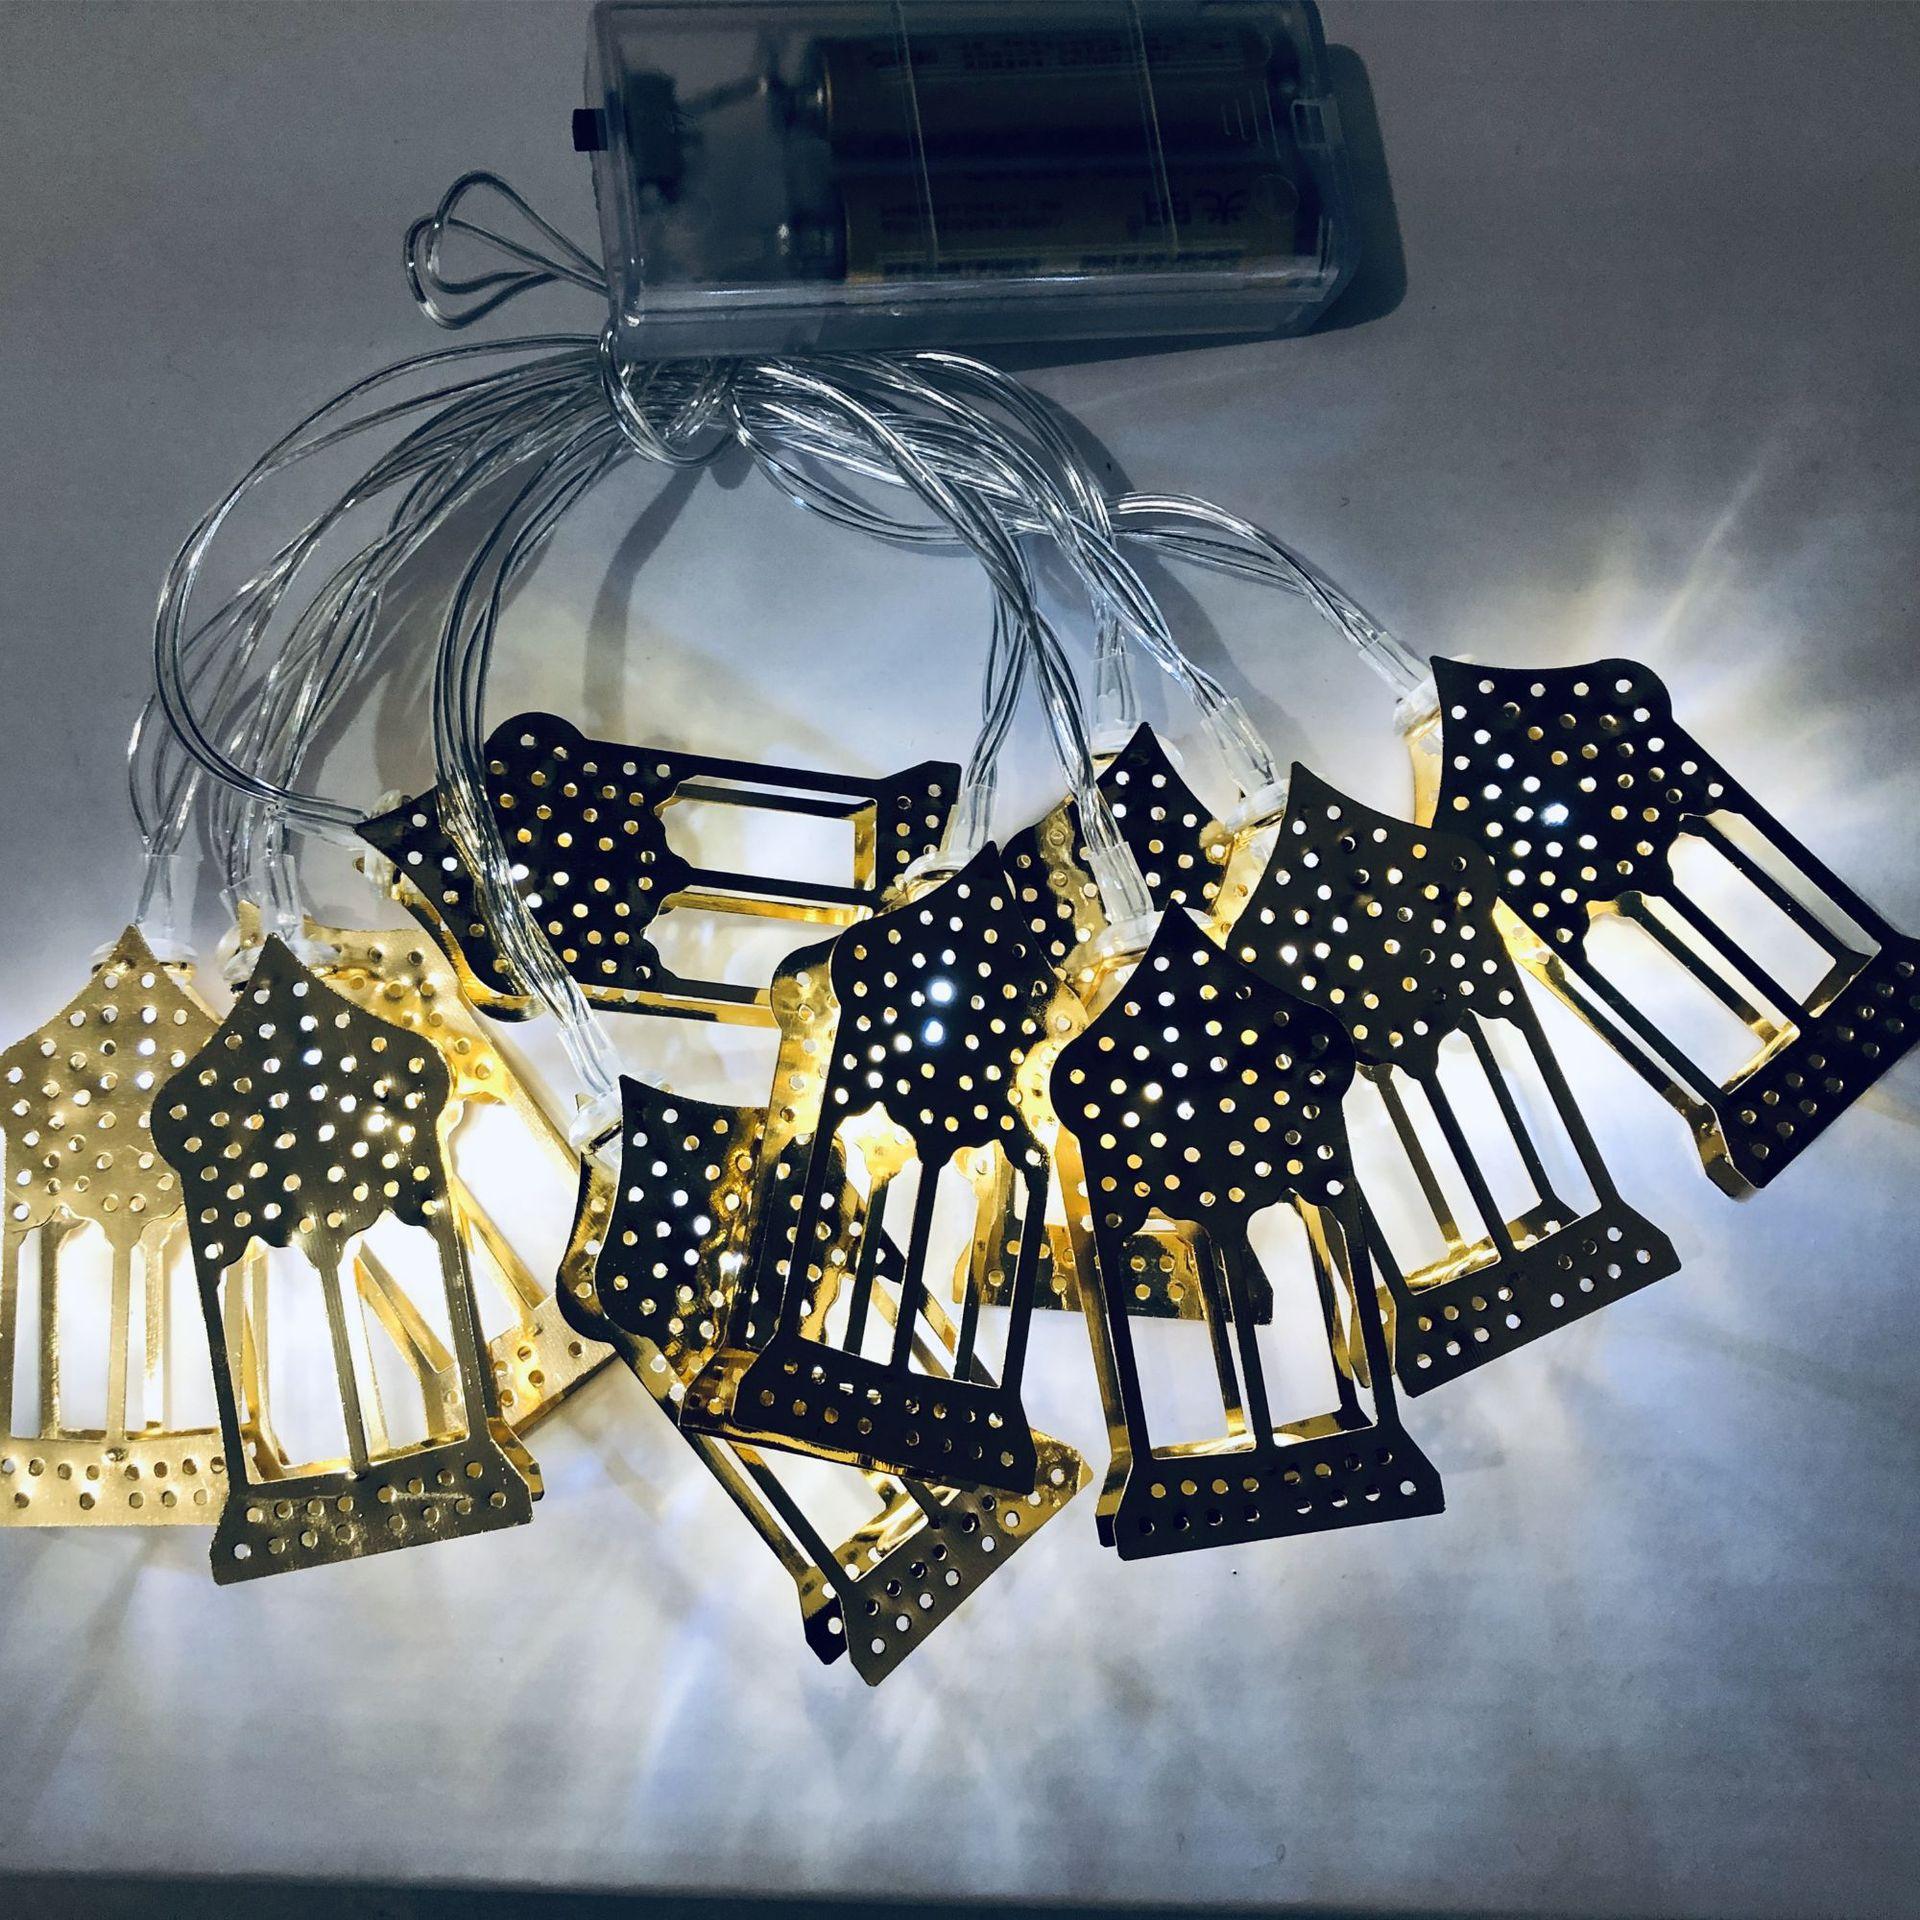 LED String Light Iron House Shape Pendant Garden Xmas Wedding Party Ramadan Eid Decor white